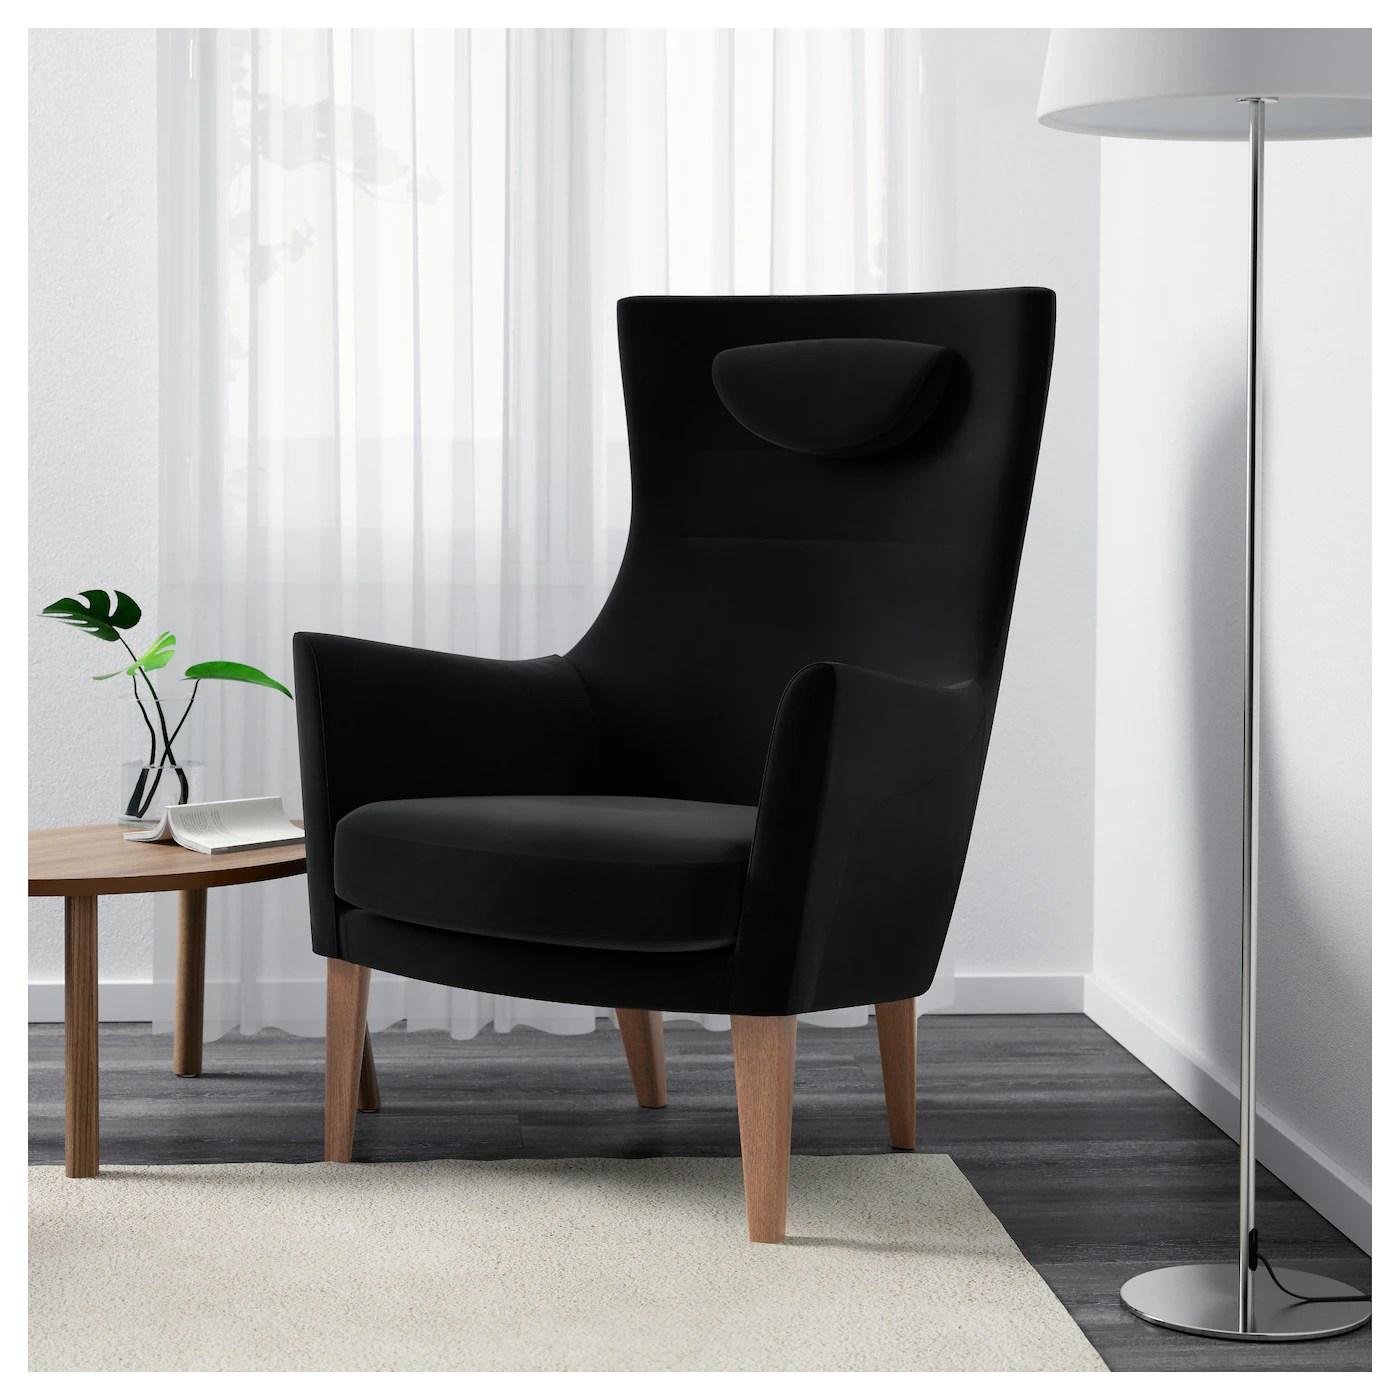 ikea high chairs desk chair no wheels arms stockholm back armchair sandbacka black